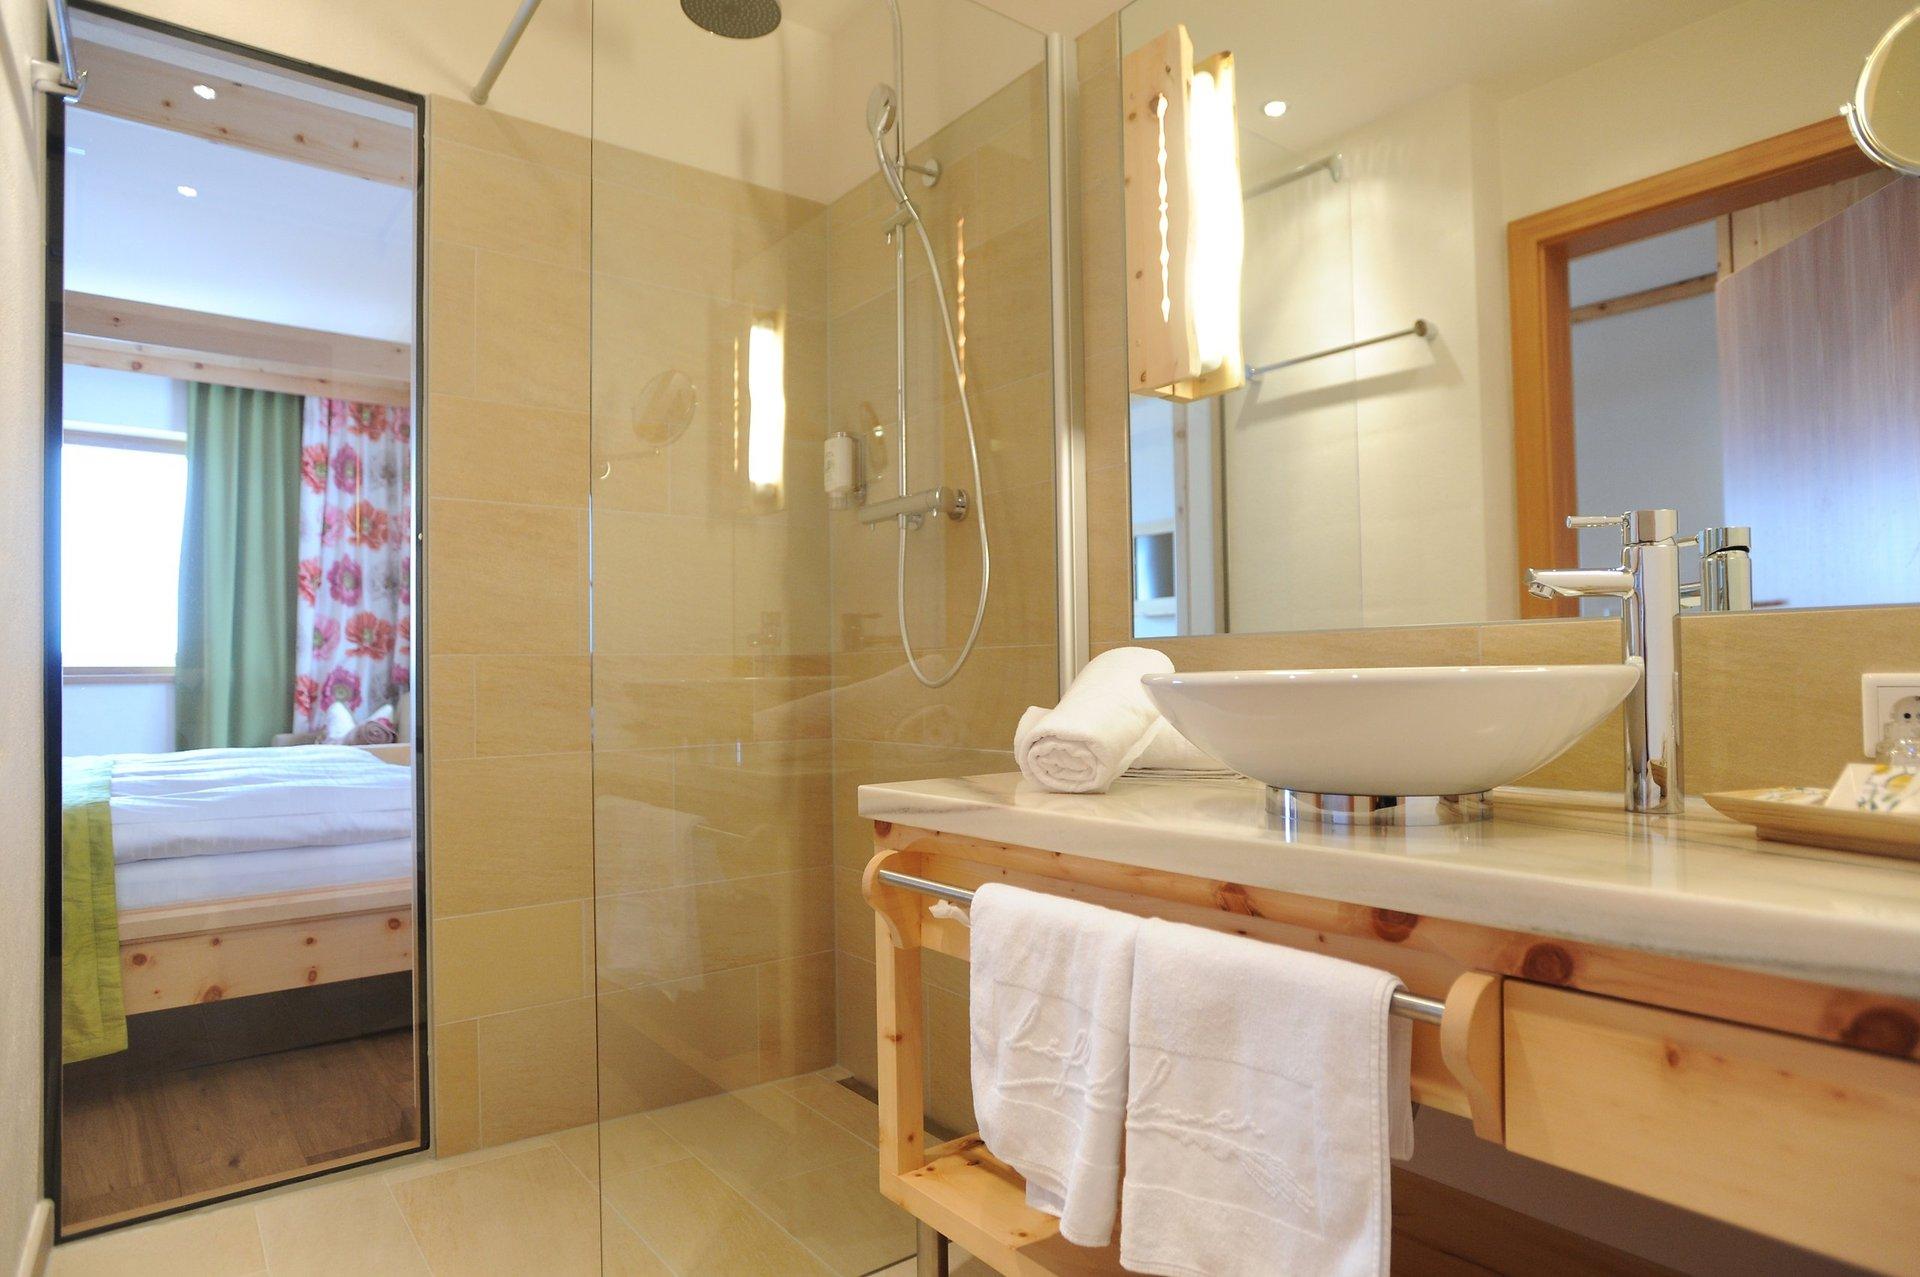 Badezimmer Dekoration Rot : Rot Wei? Badezimmer ...